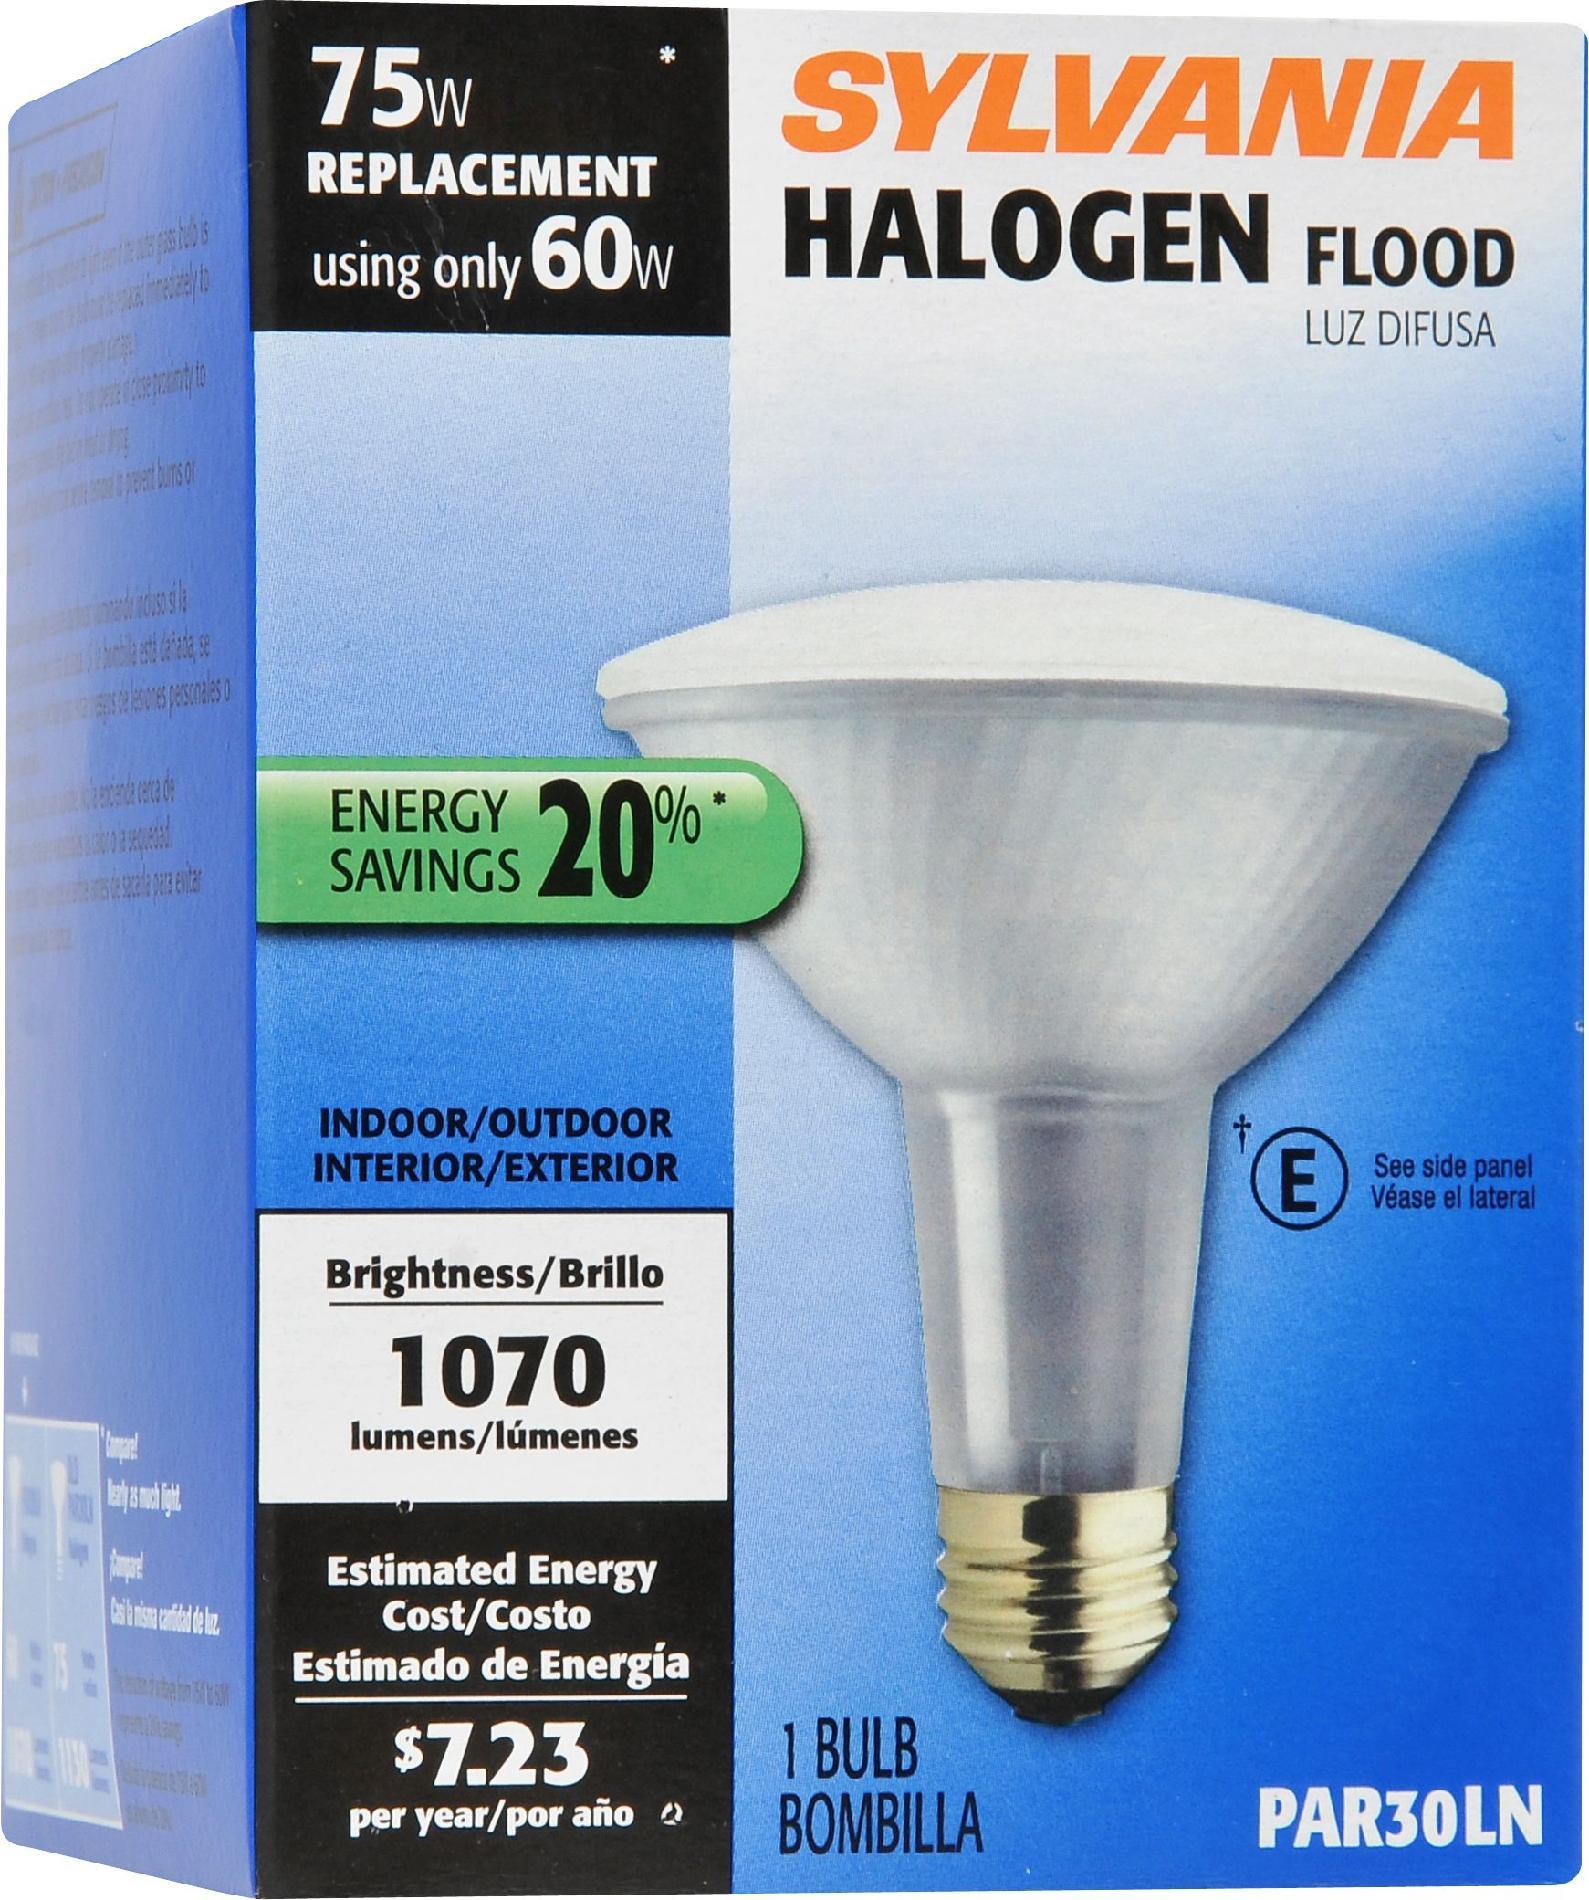 Sylvania Halogen Silver Wide Flood Lamp PAR30LNMedium